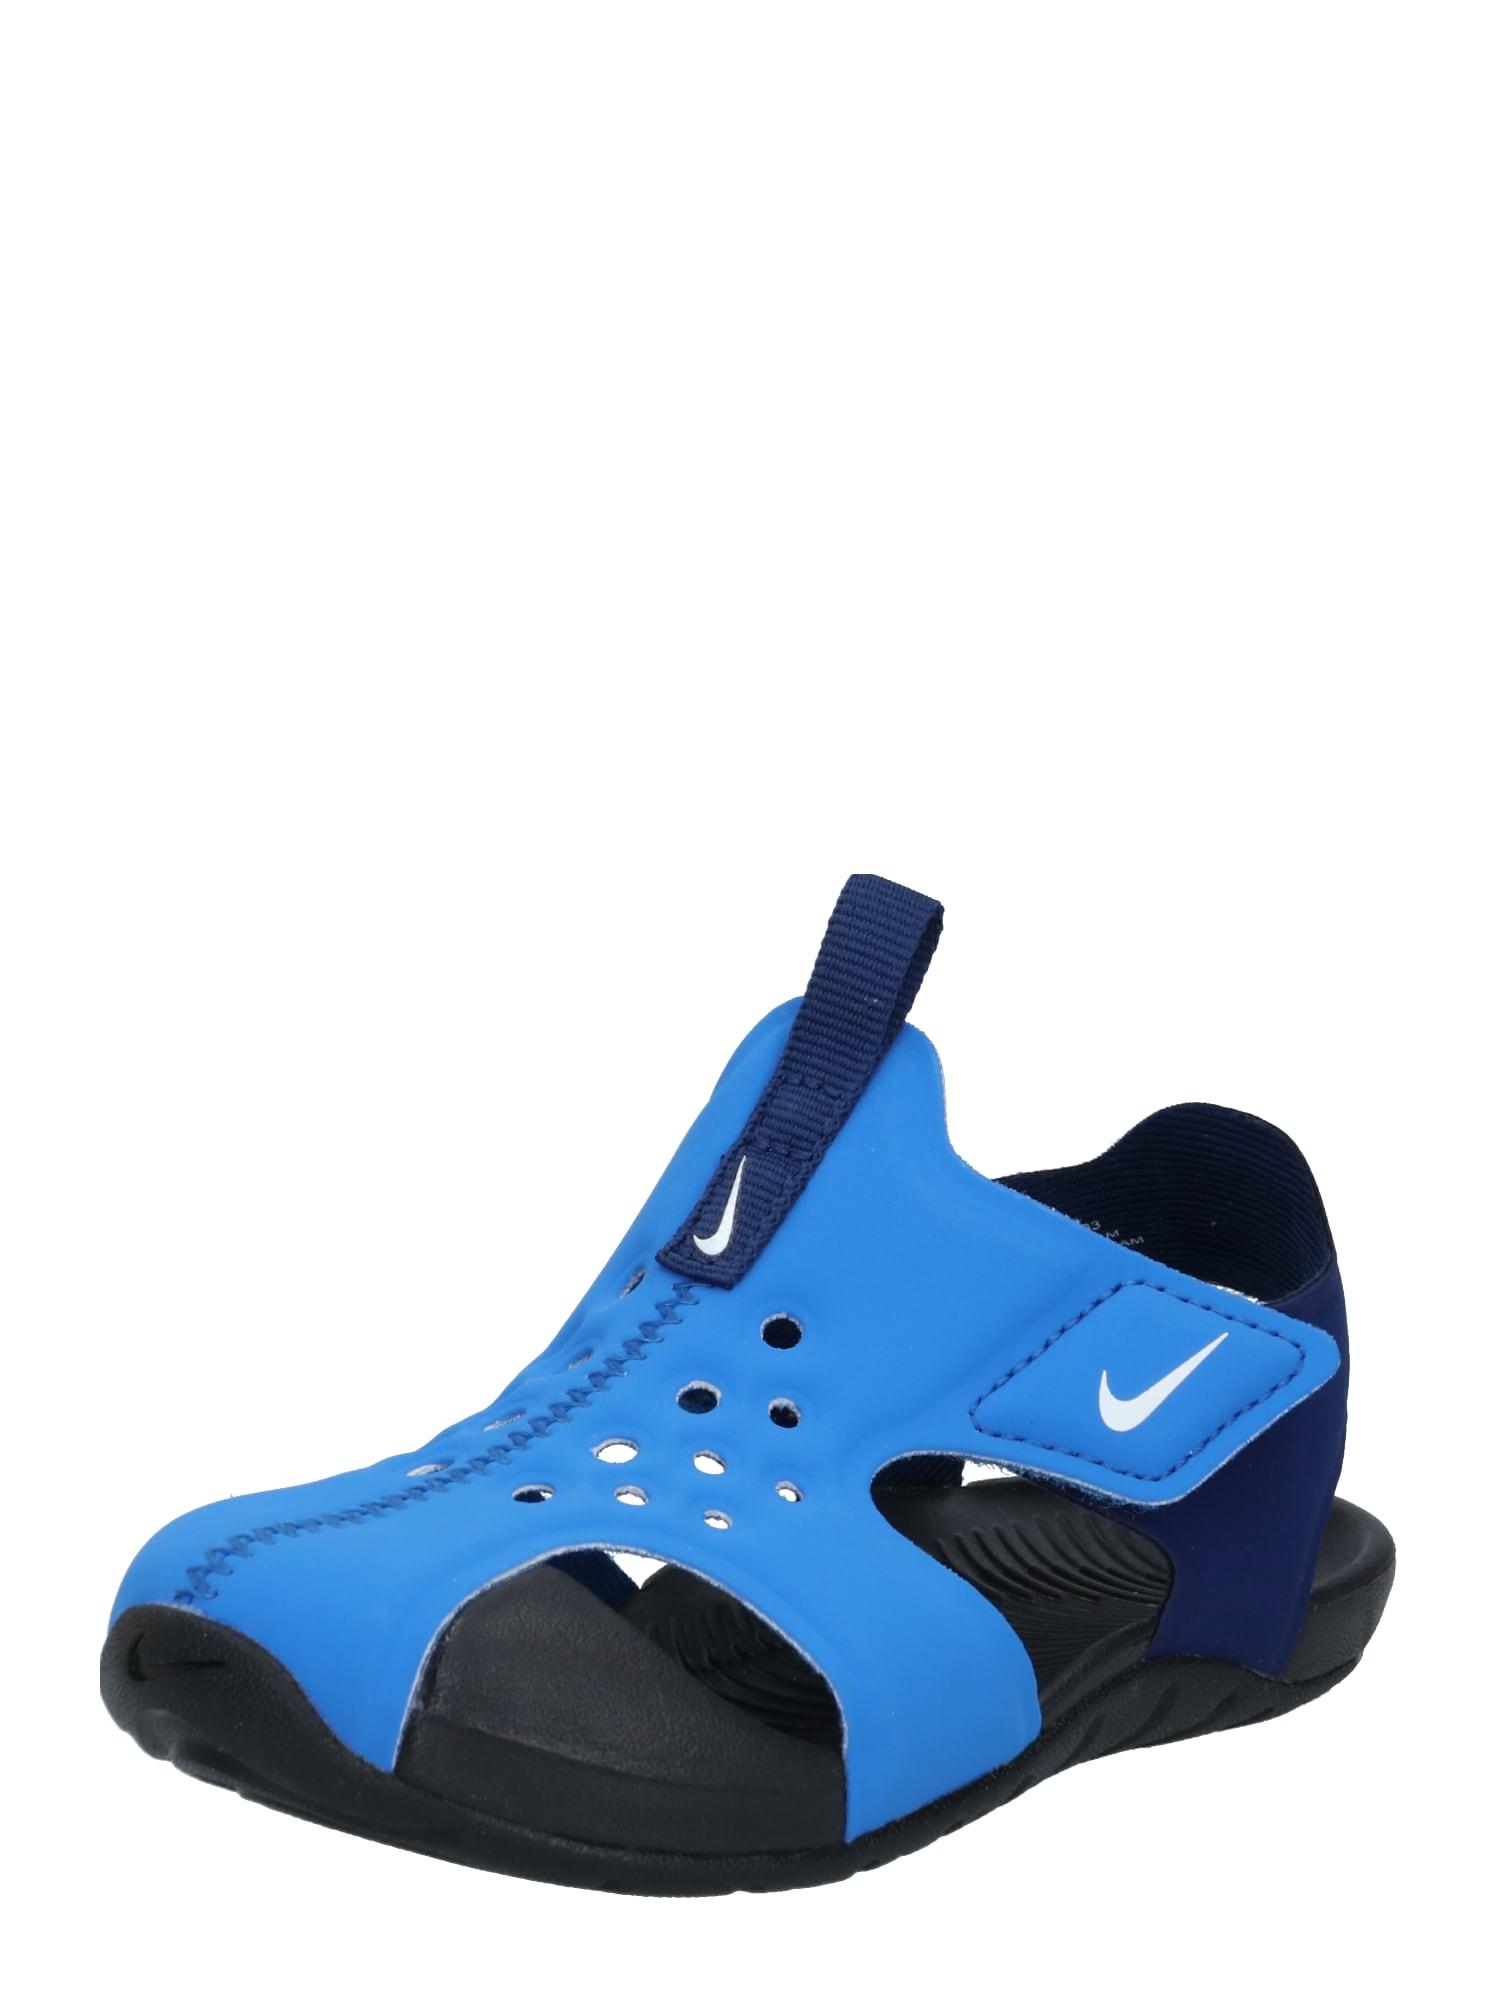 Nike Sportswear Atviri batai mėlyna